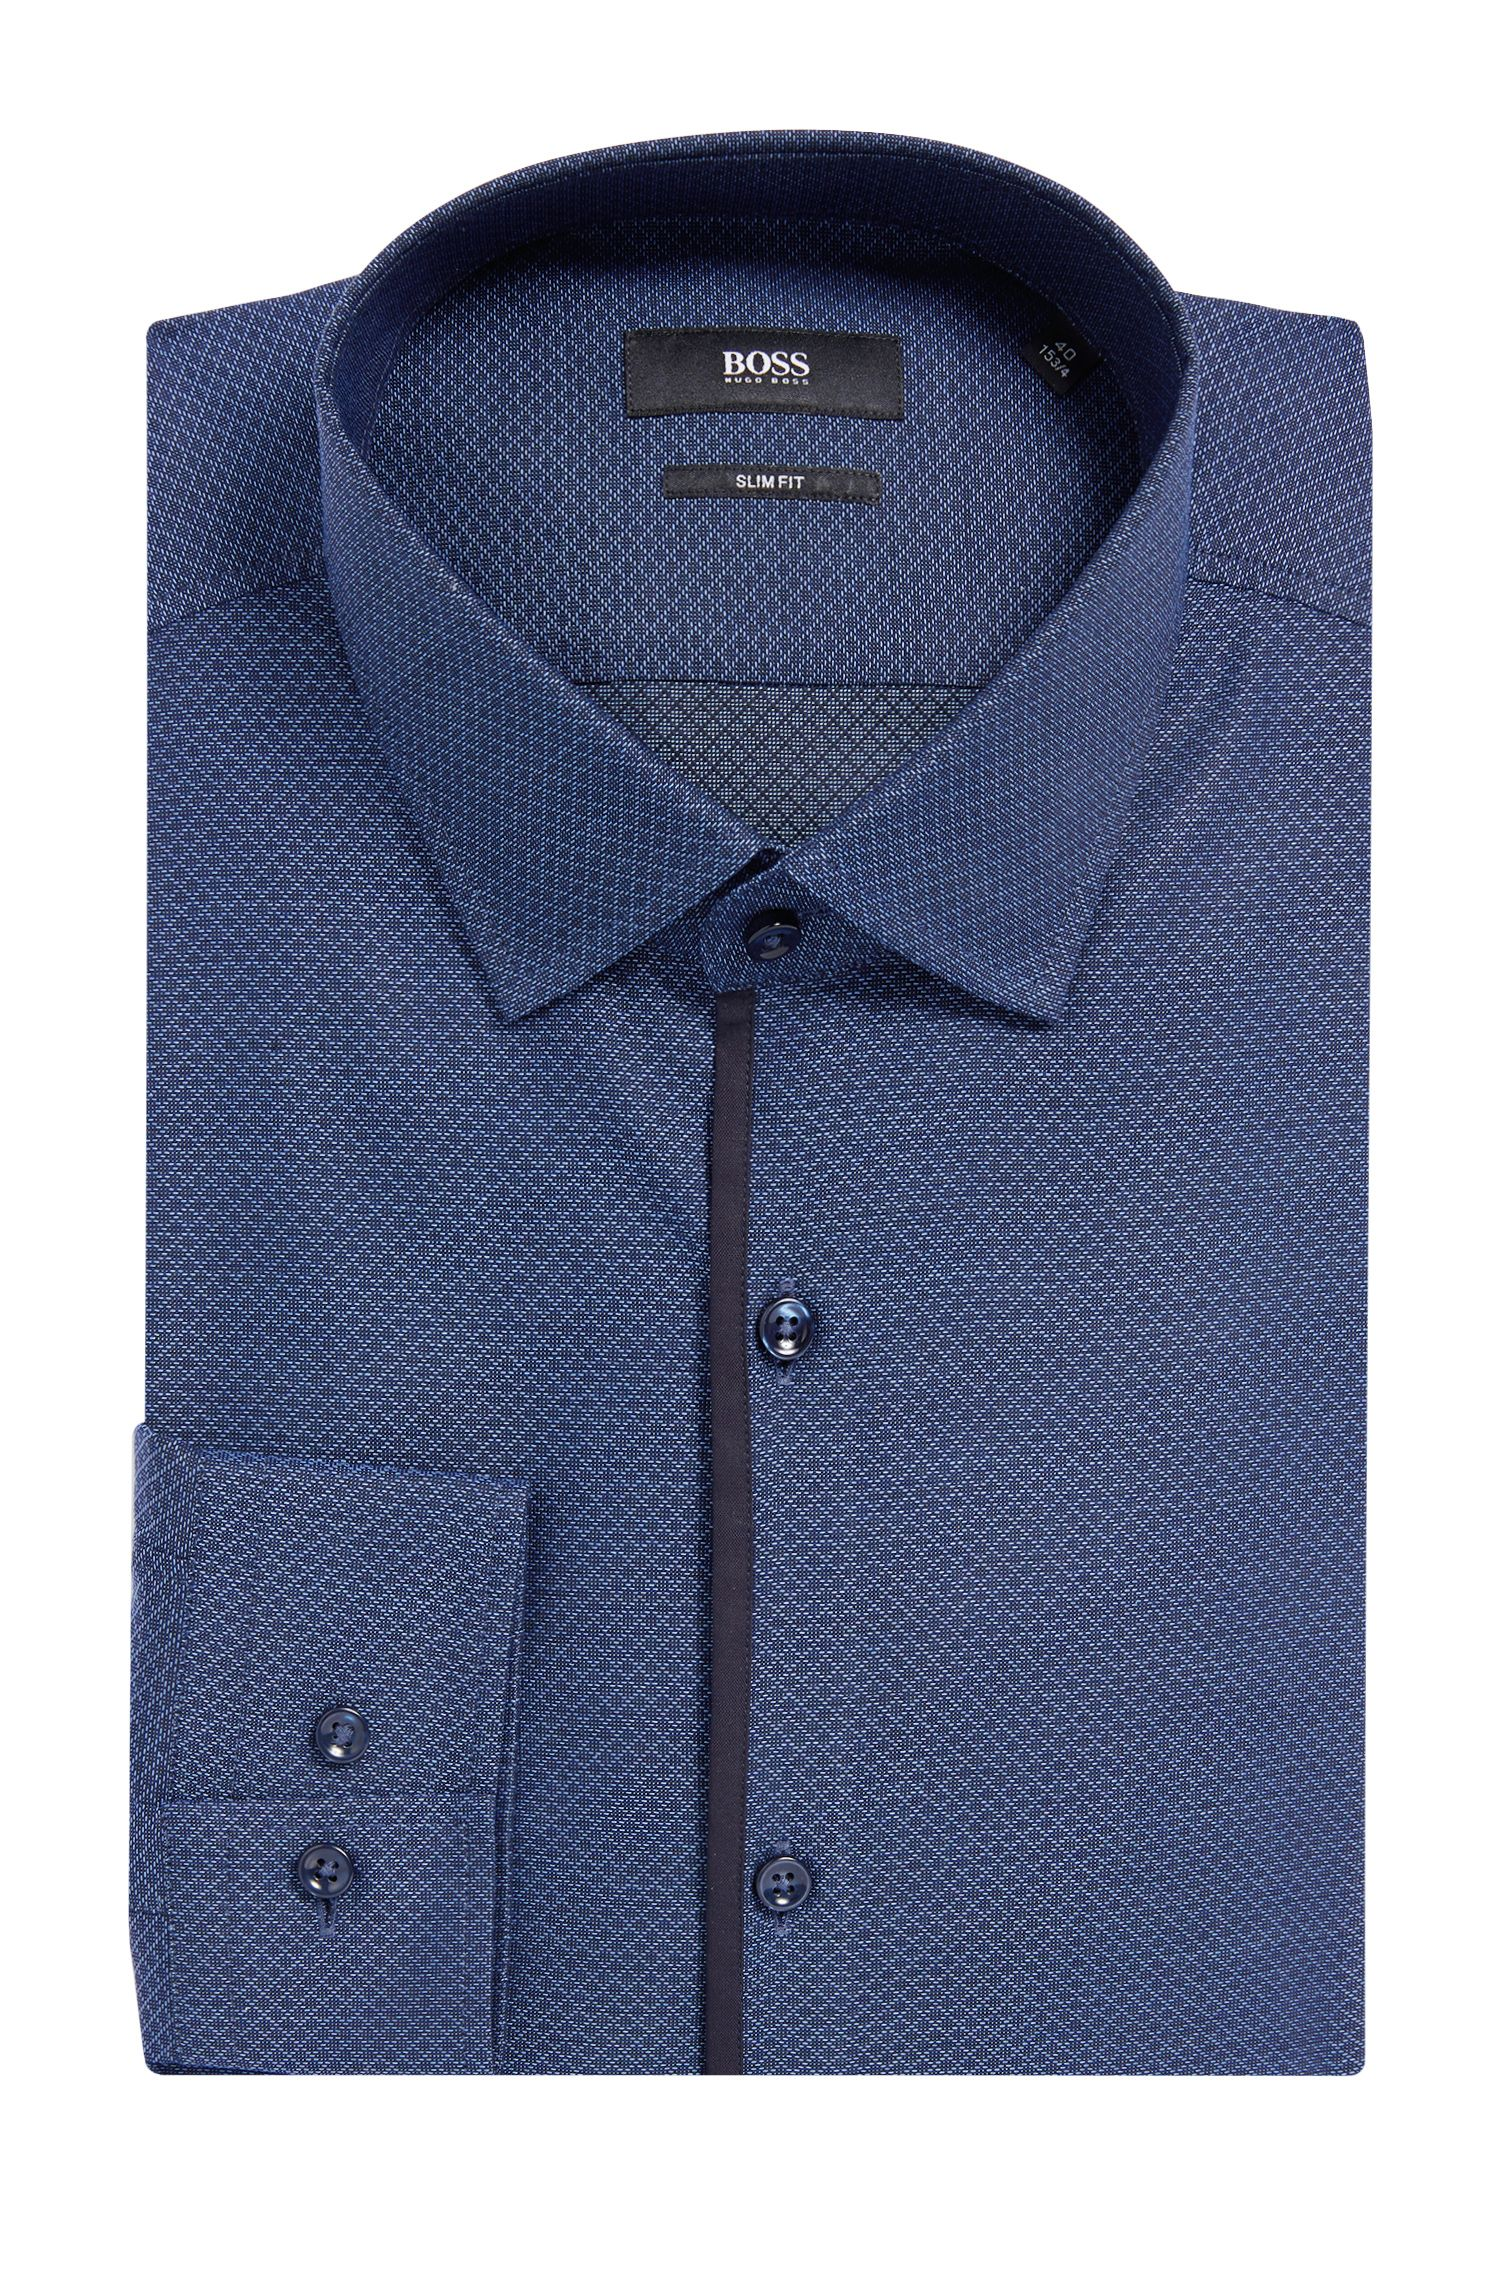 'Jeldrik' | Slim Fit, Diamond Pattern Cotton Dress Shirt